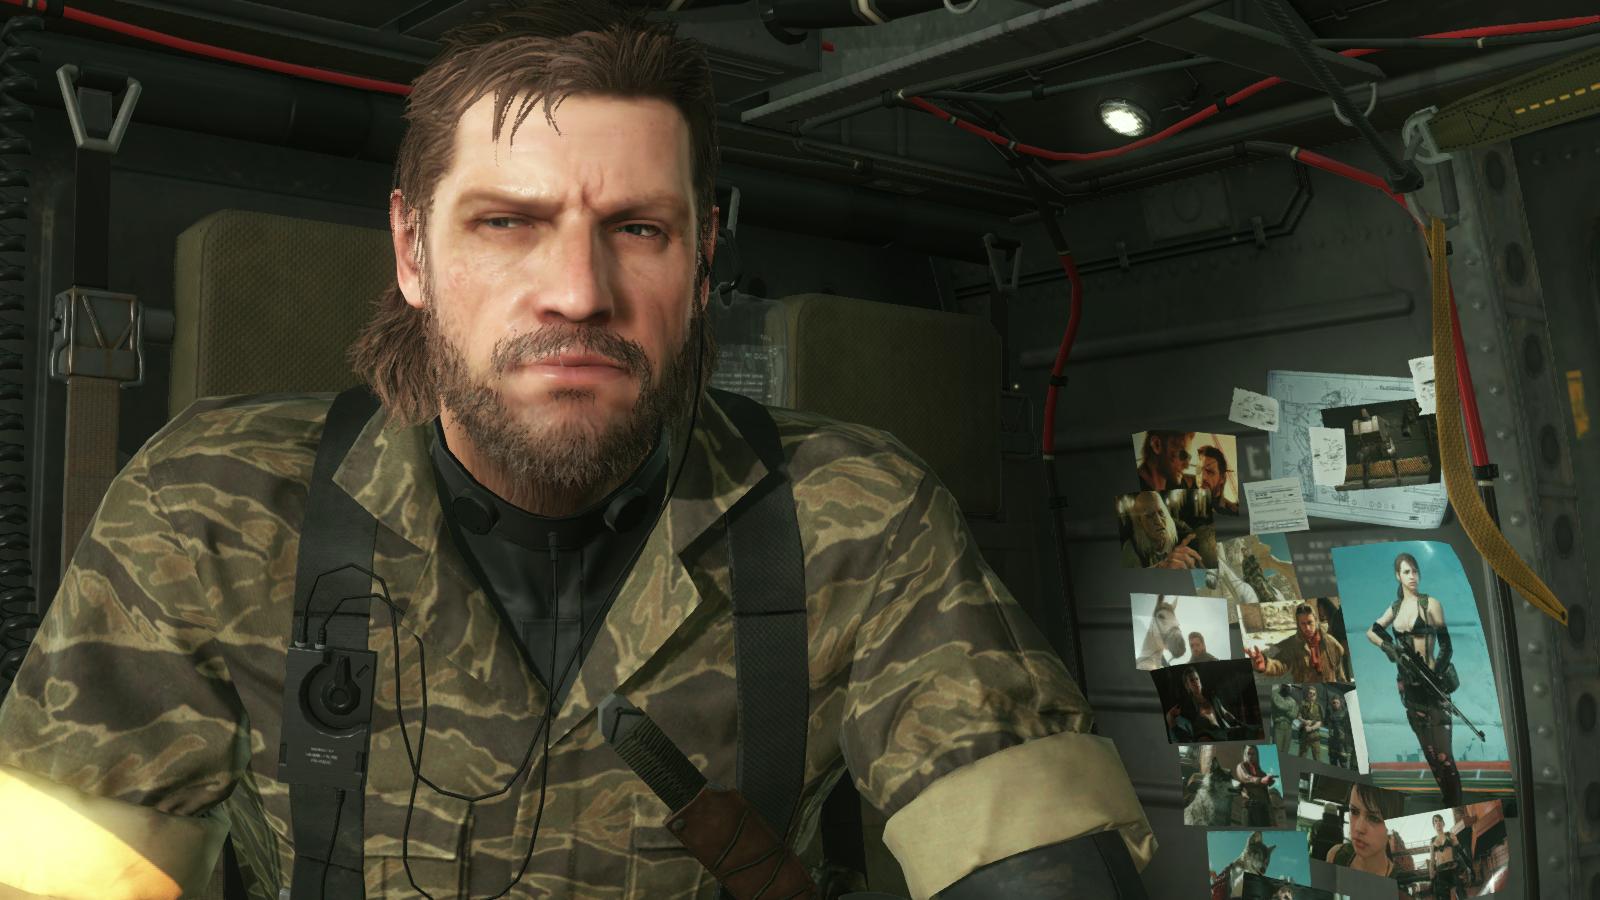 272 0 1457946955 Png 1 600 900ピクセル Metal Gear Big Boss Metal Gear Metal Gear Series